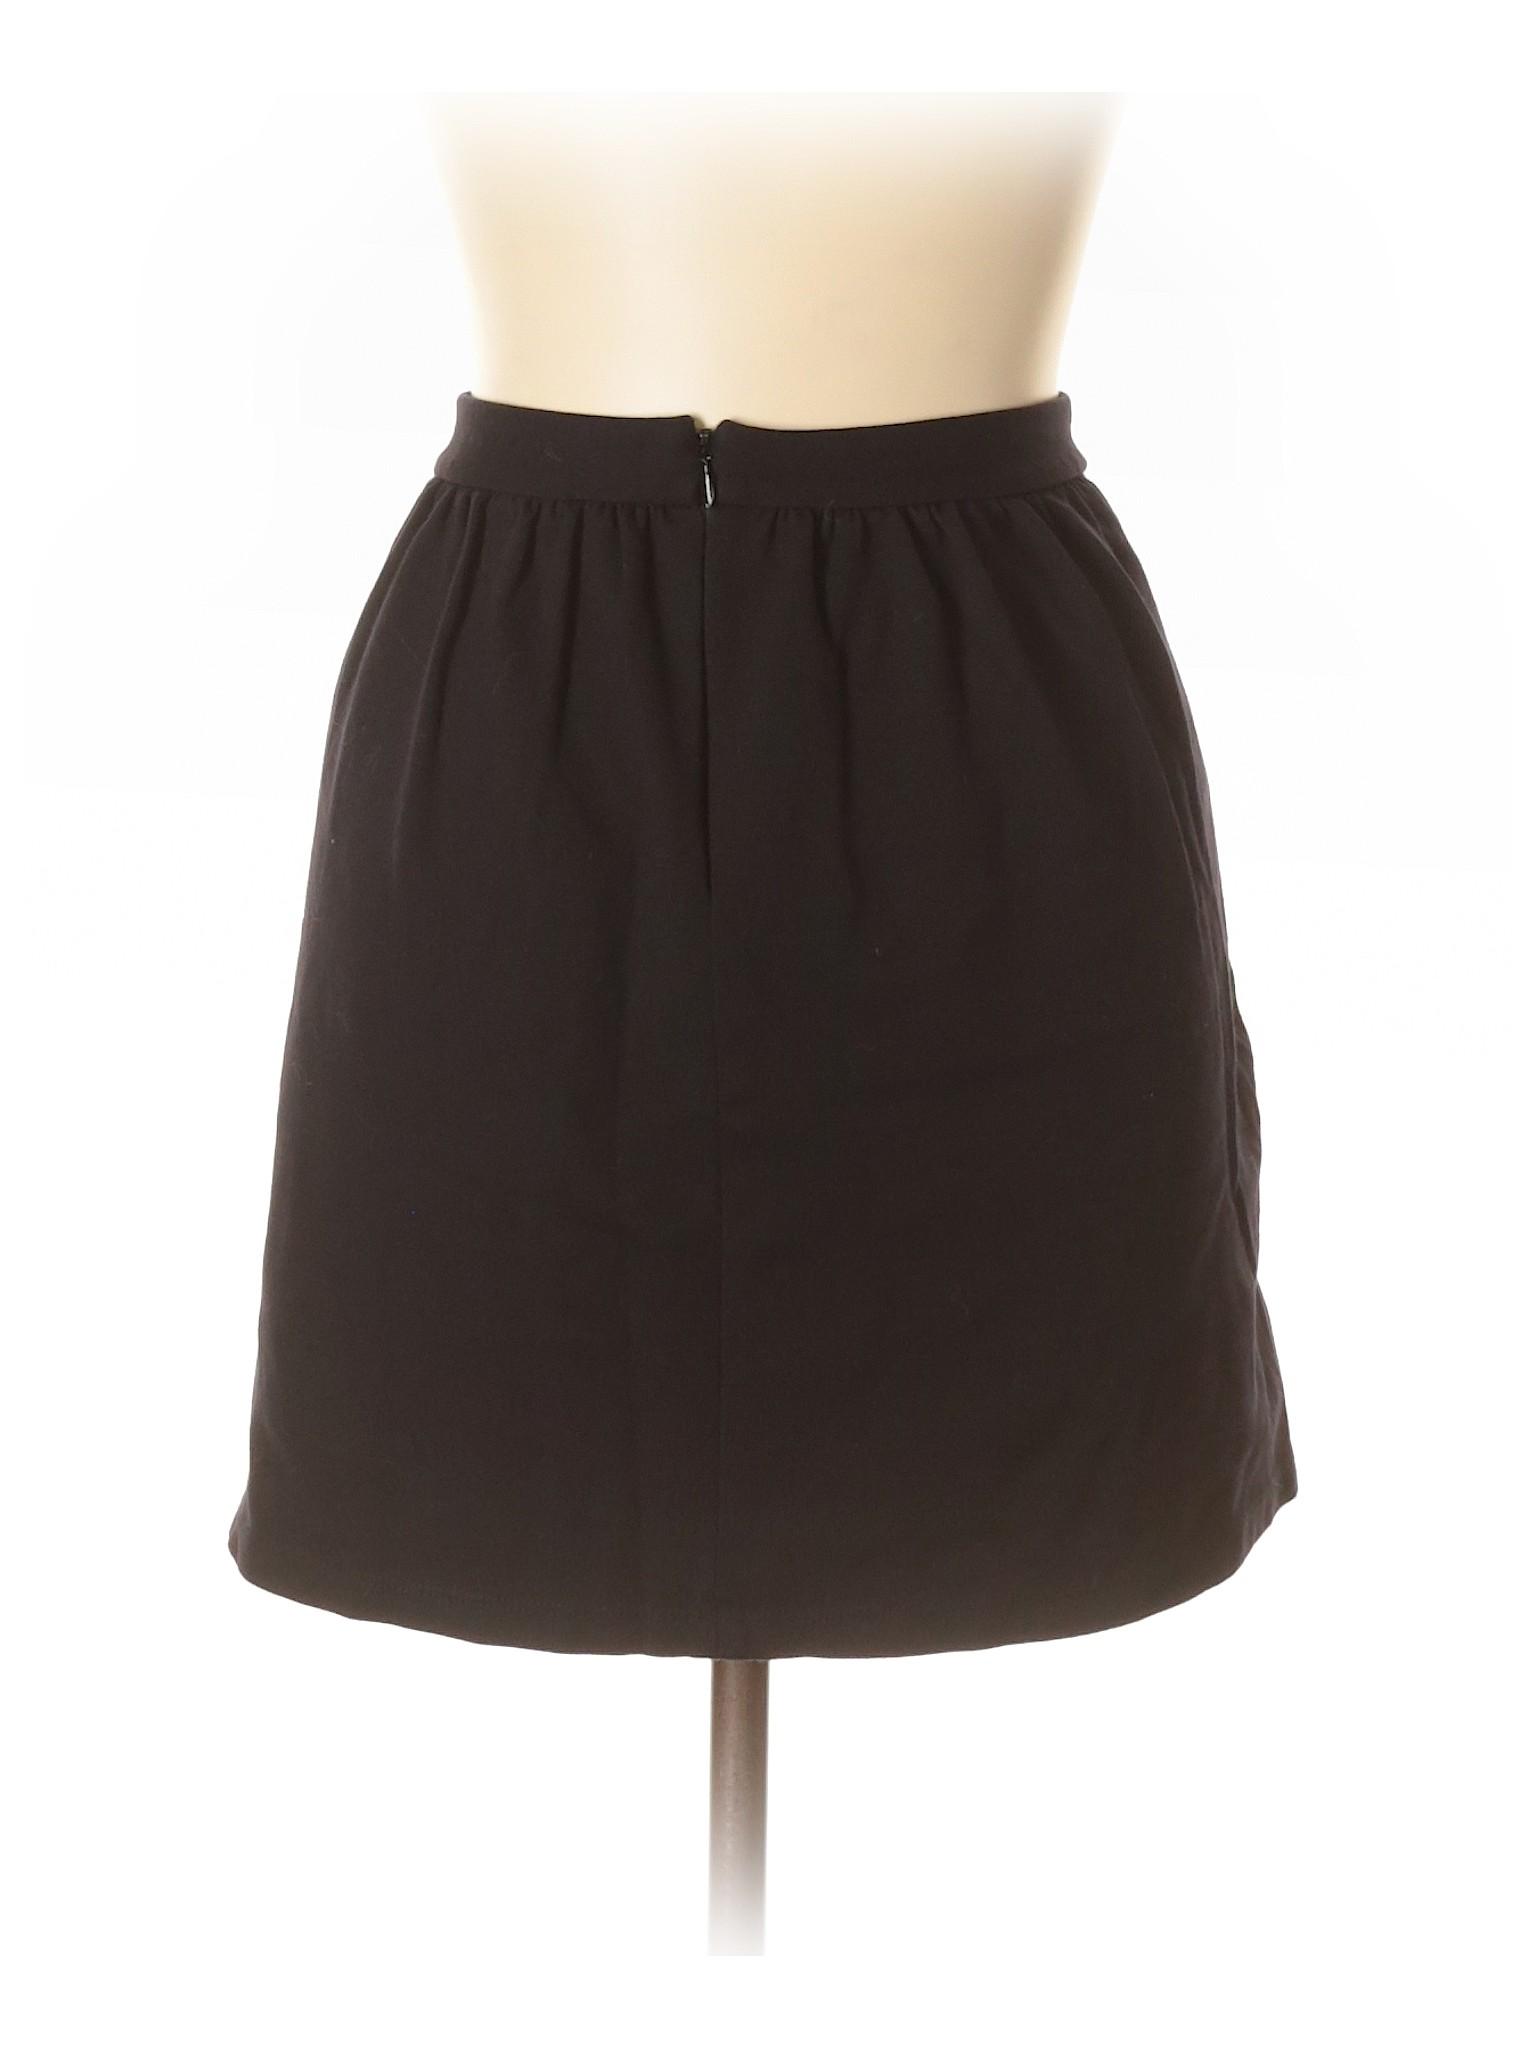 Skirt Skirt Casual Skirt Casual Boutique Casual Boutique Boutique Skirt Boutique Casual XqBx4RZYw